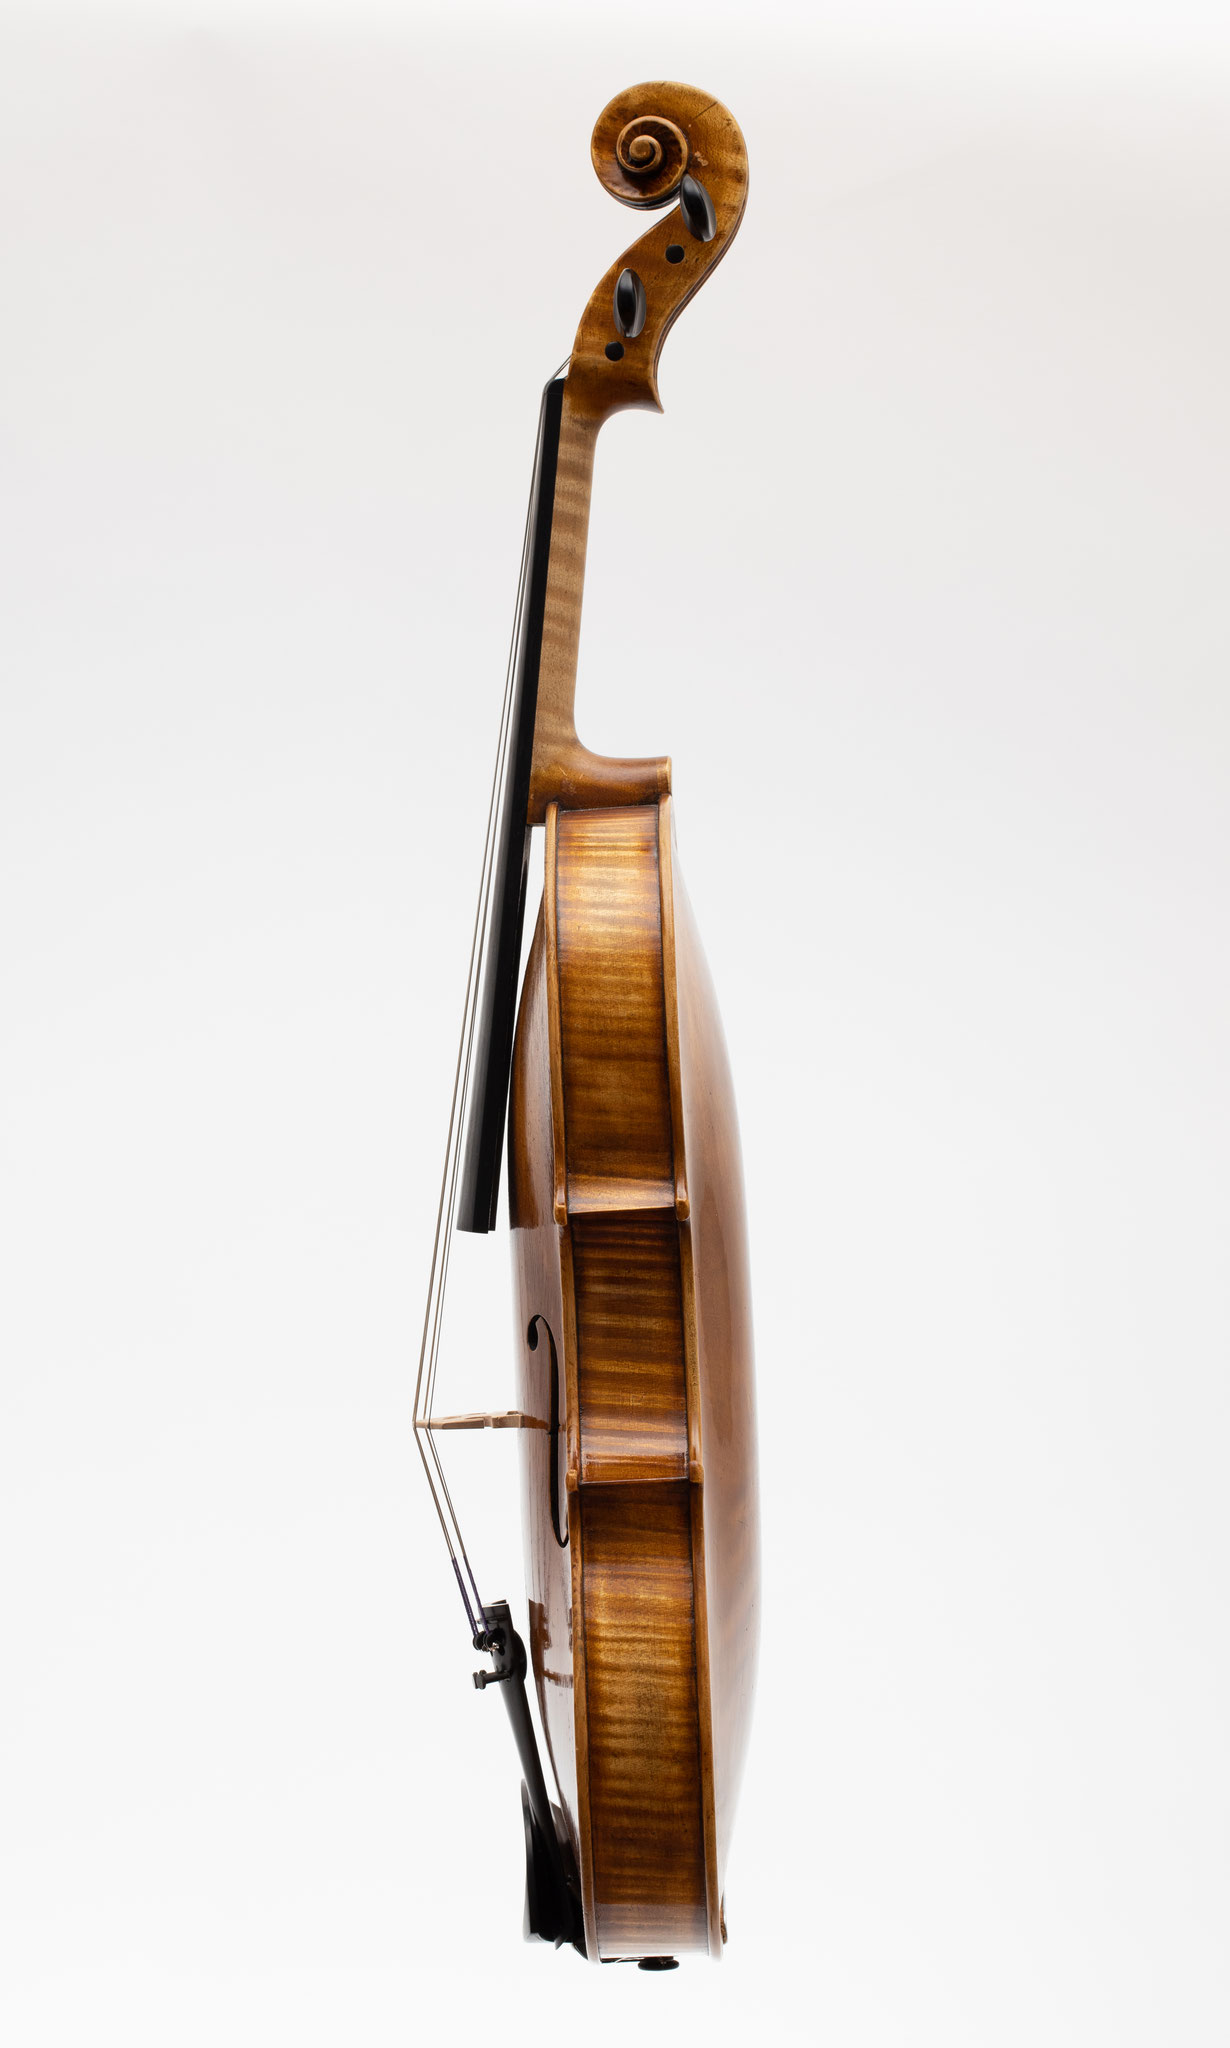 Viola nach Andrea Guarneri (2018/CH), Photo: VDB Photography